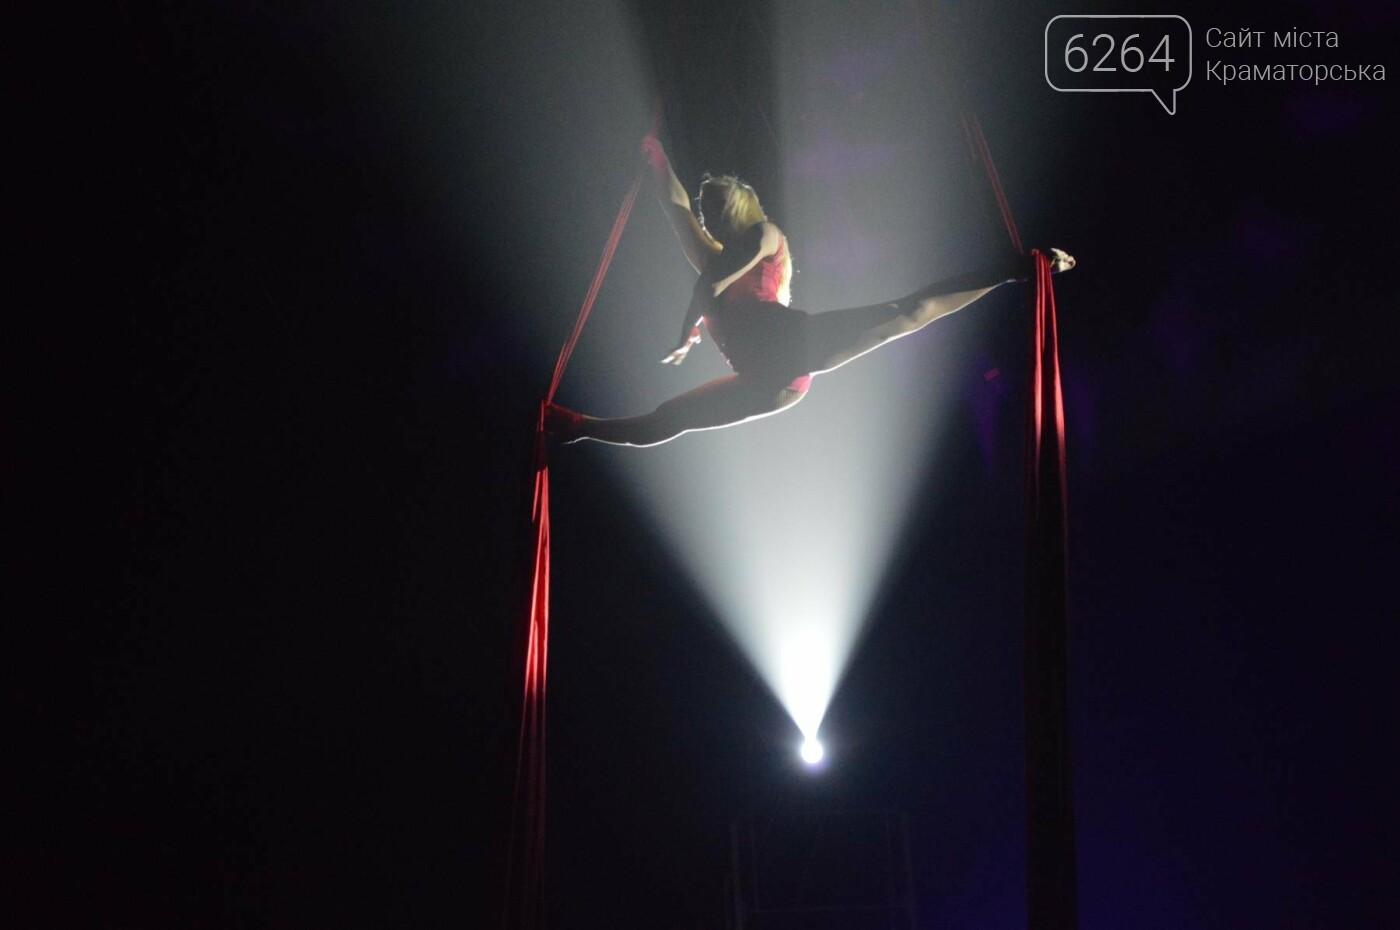 Новое шоу цирка «Кобзов» произвело фурор в Краматорске, фото-6